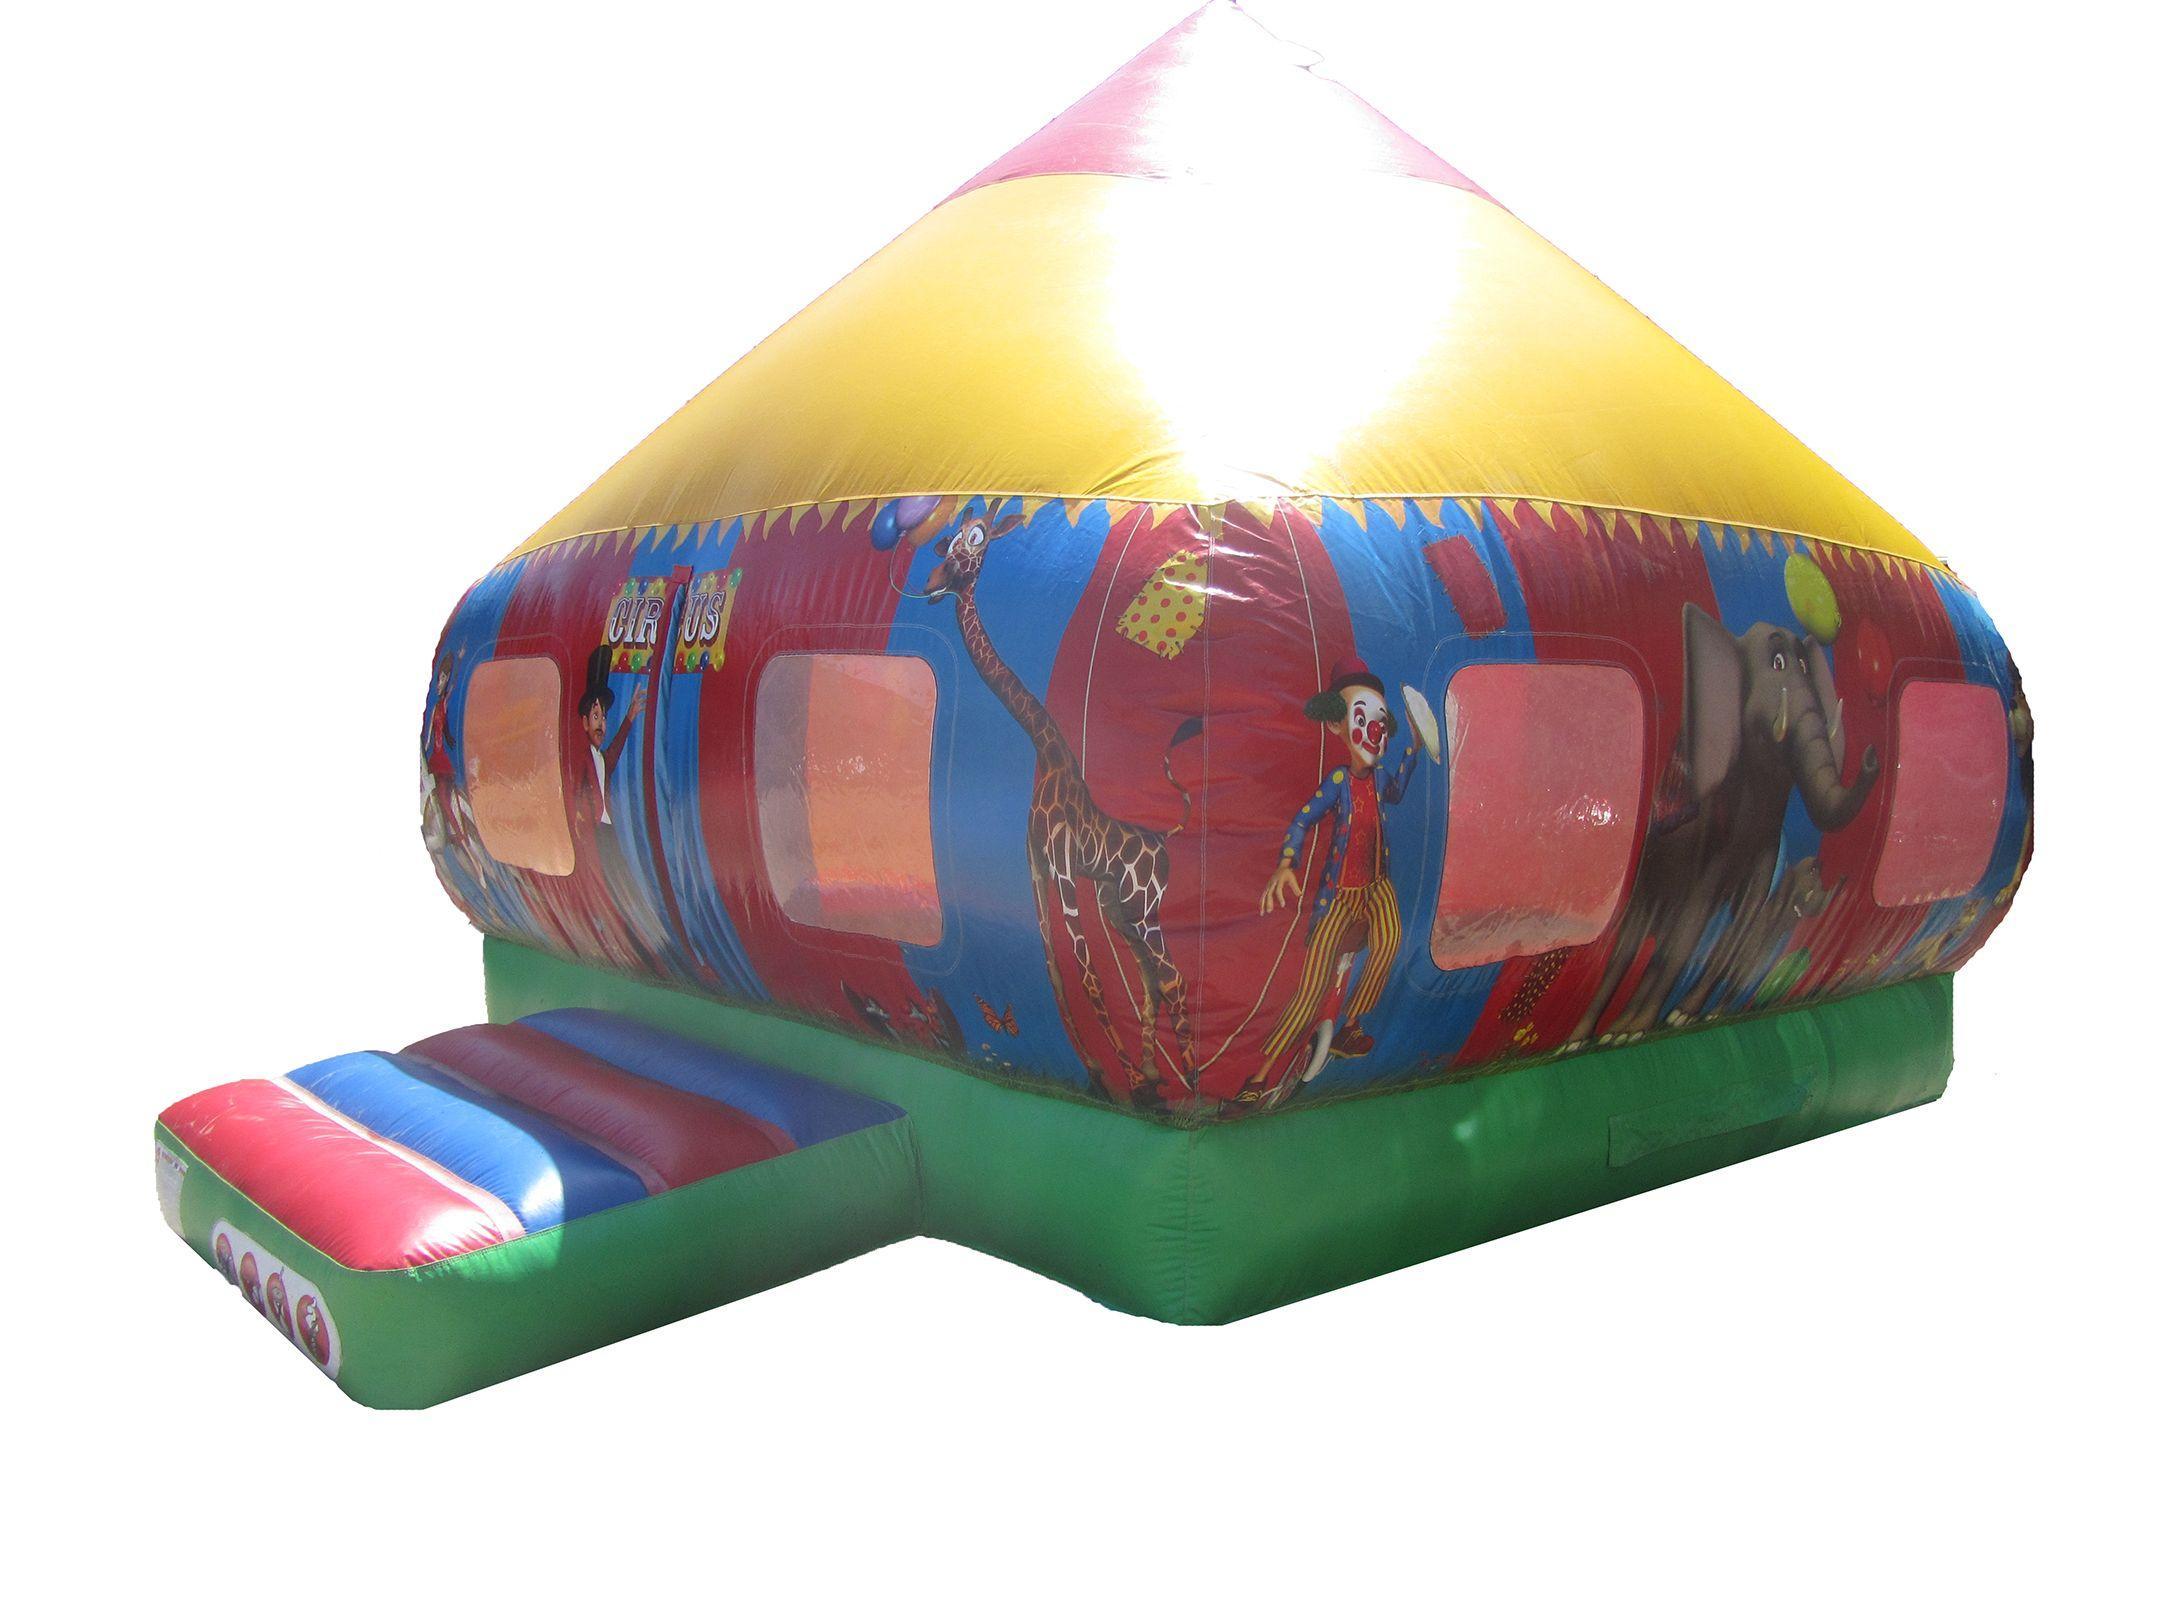 Circus Themed Moonwalk Bouncer